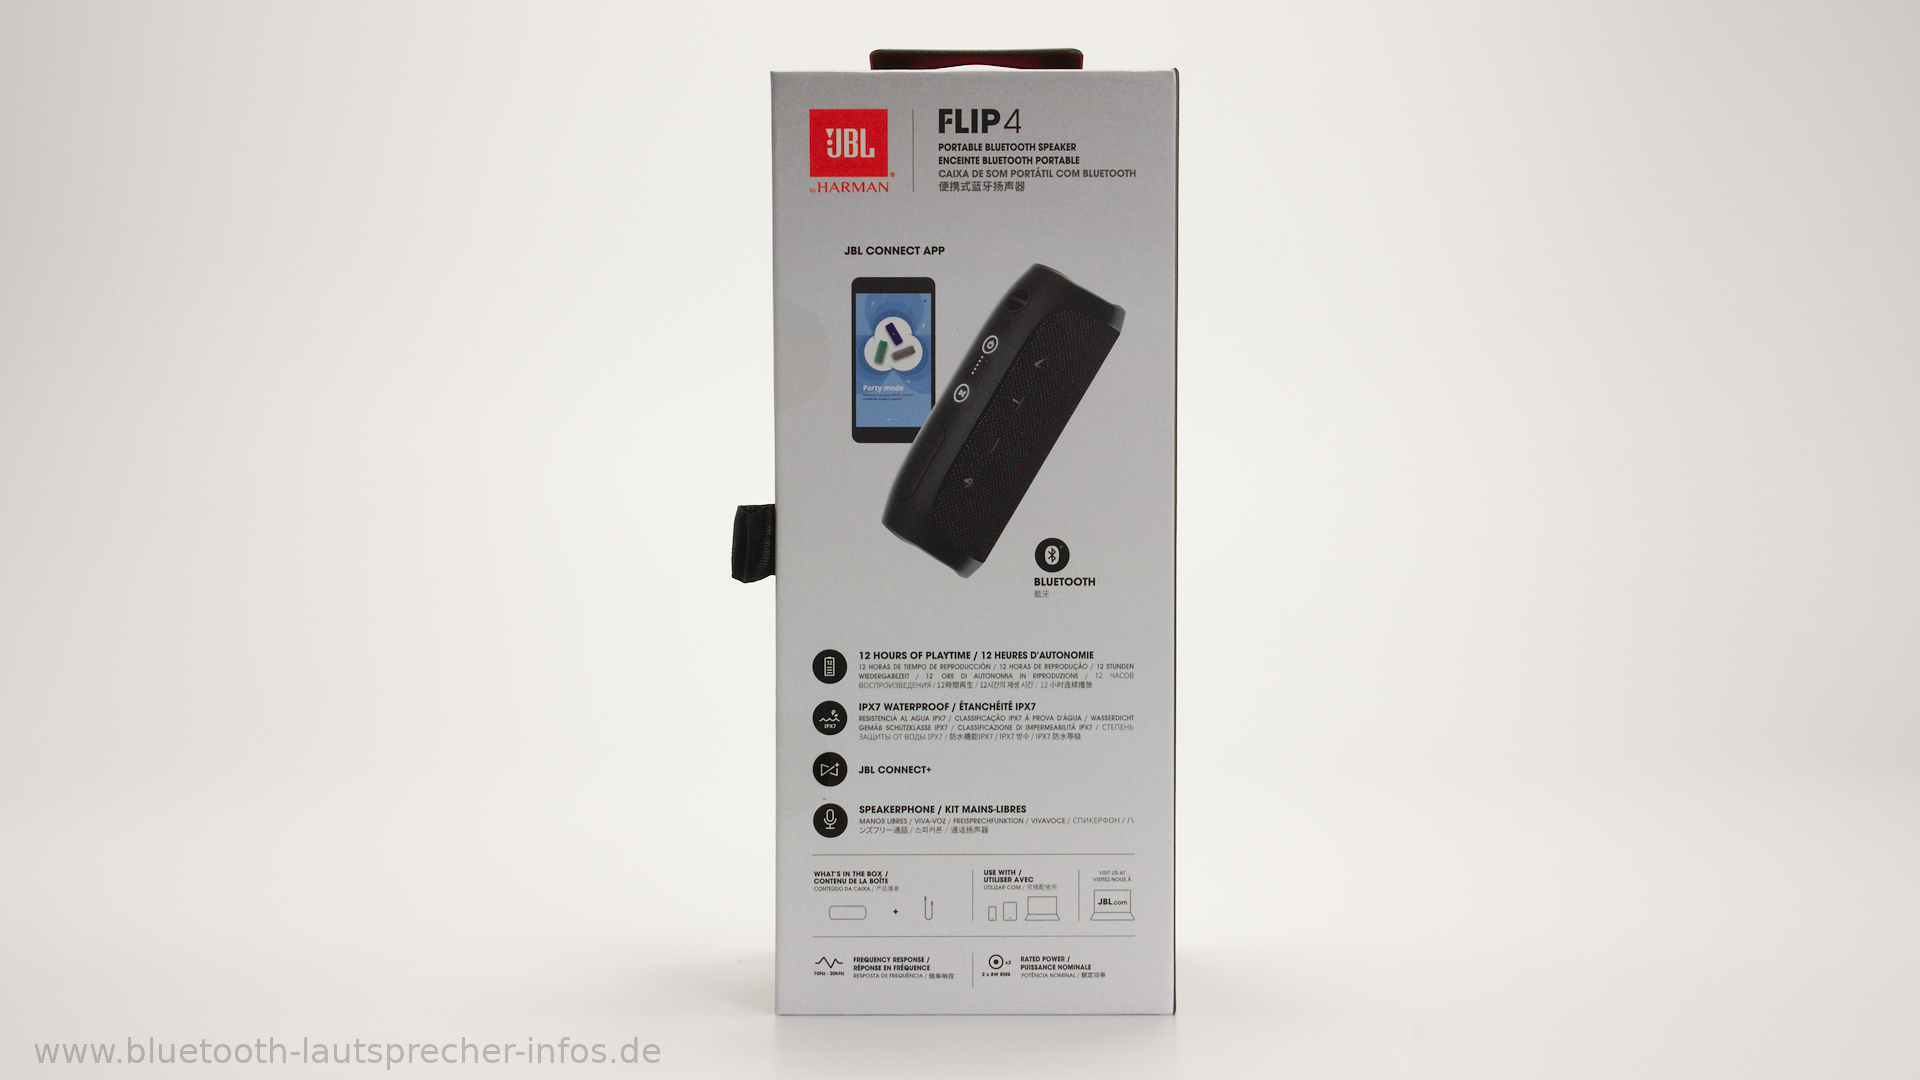 JBL Flip 4 - Kompakter Bluetooth-Lautsprecher im Test